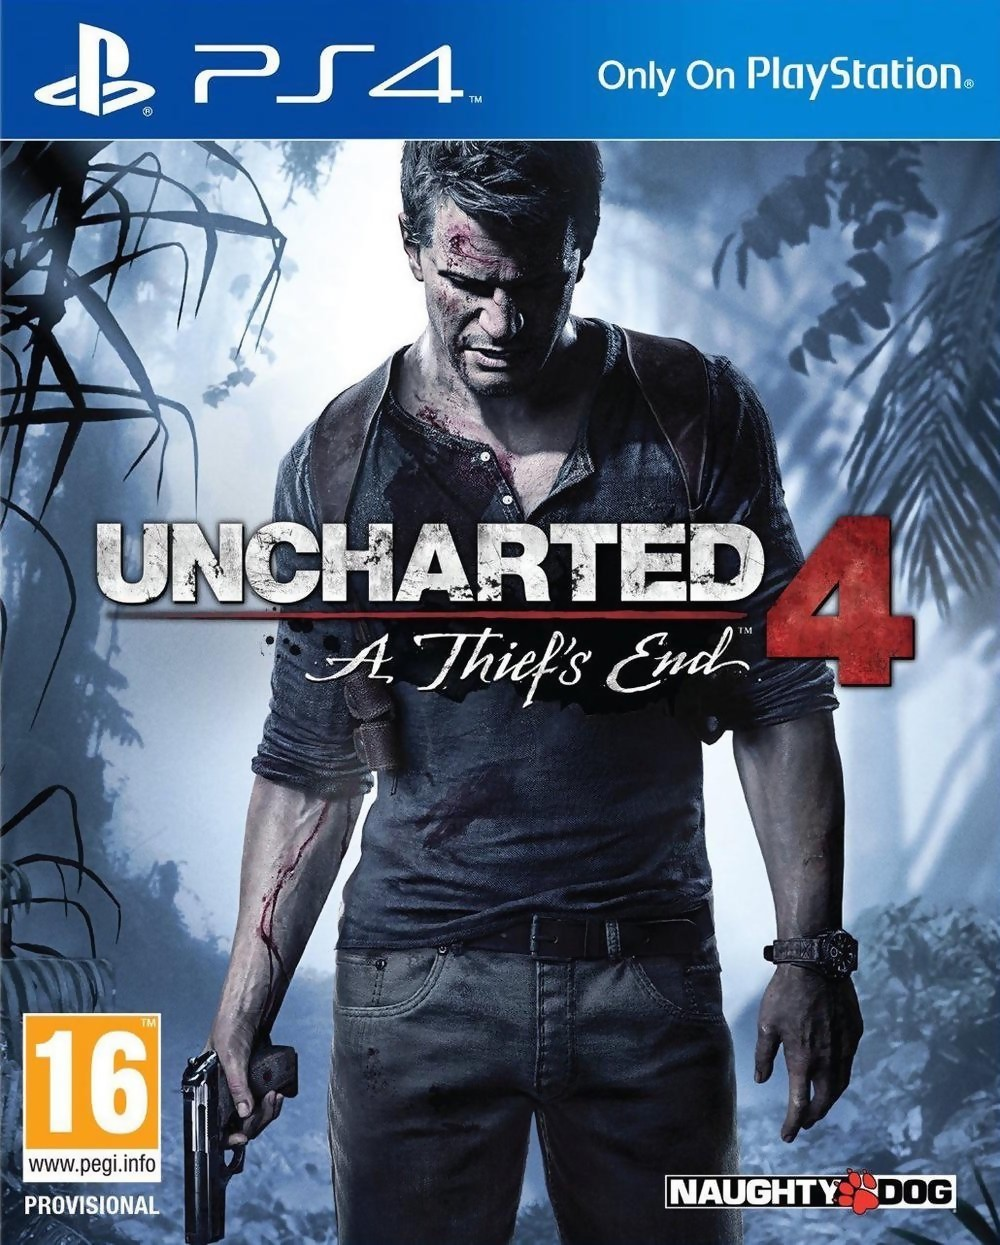 uncharted-4-a-thief-s-e-56d68eb16a3b6 jpg